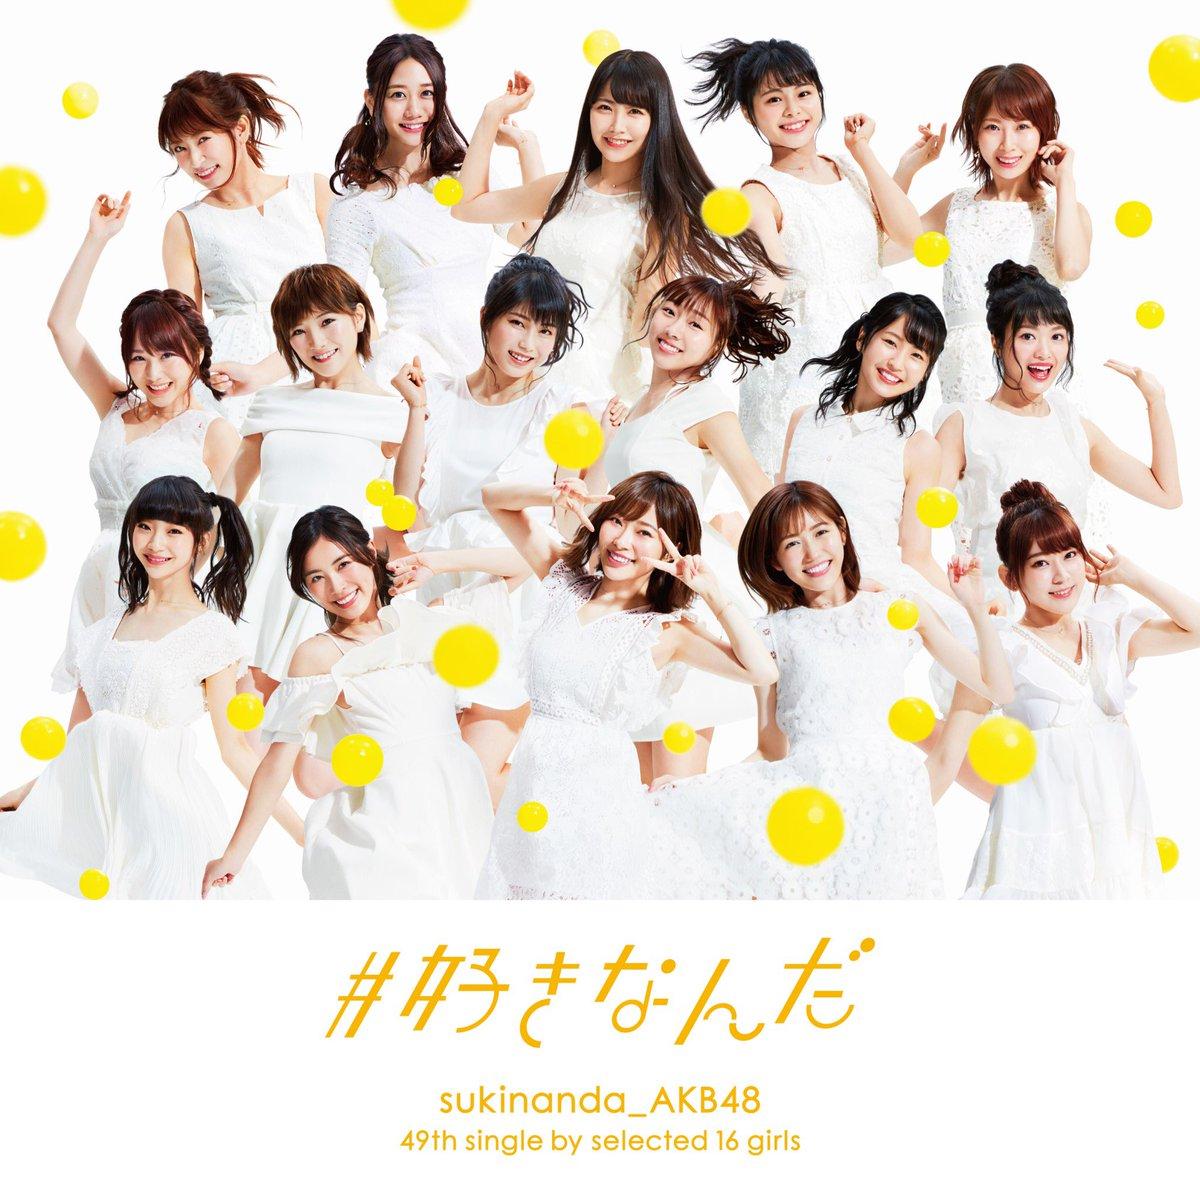 20170831.0121.1 AKB48 - #SukiNanda (Theater edition) cover 11.jpg